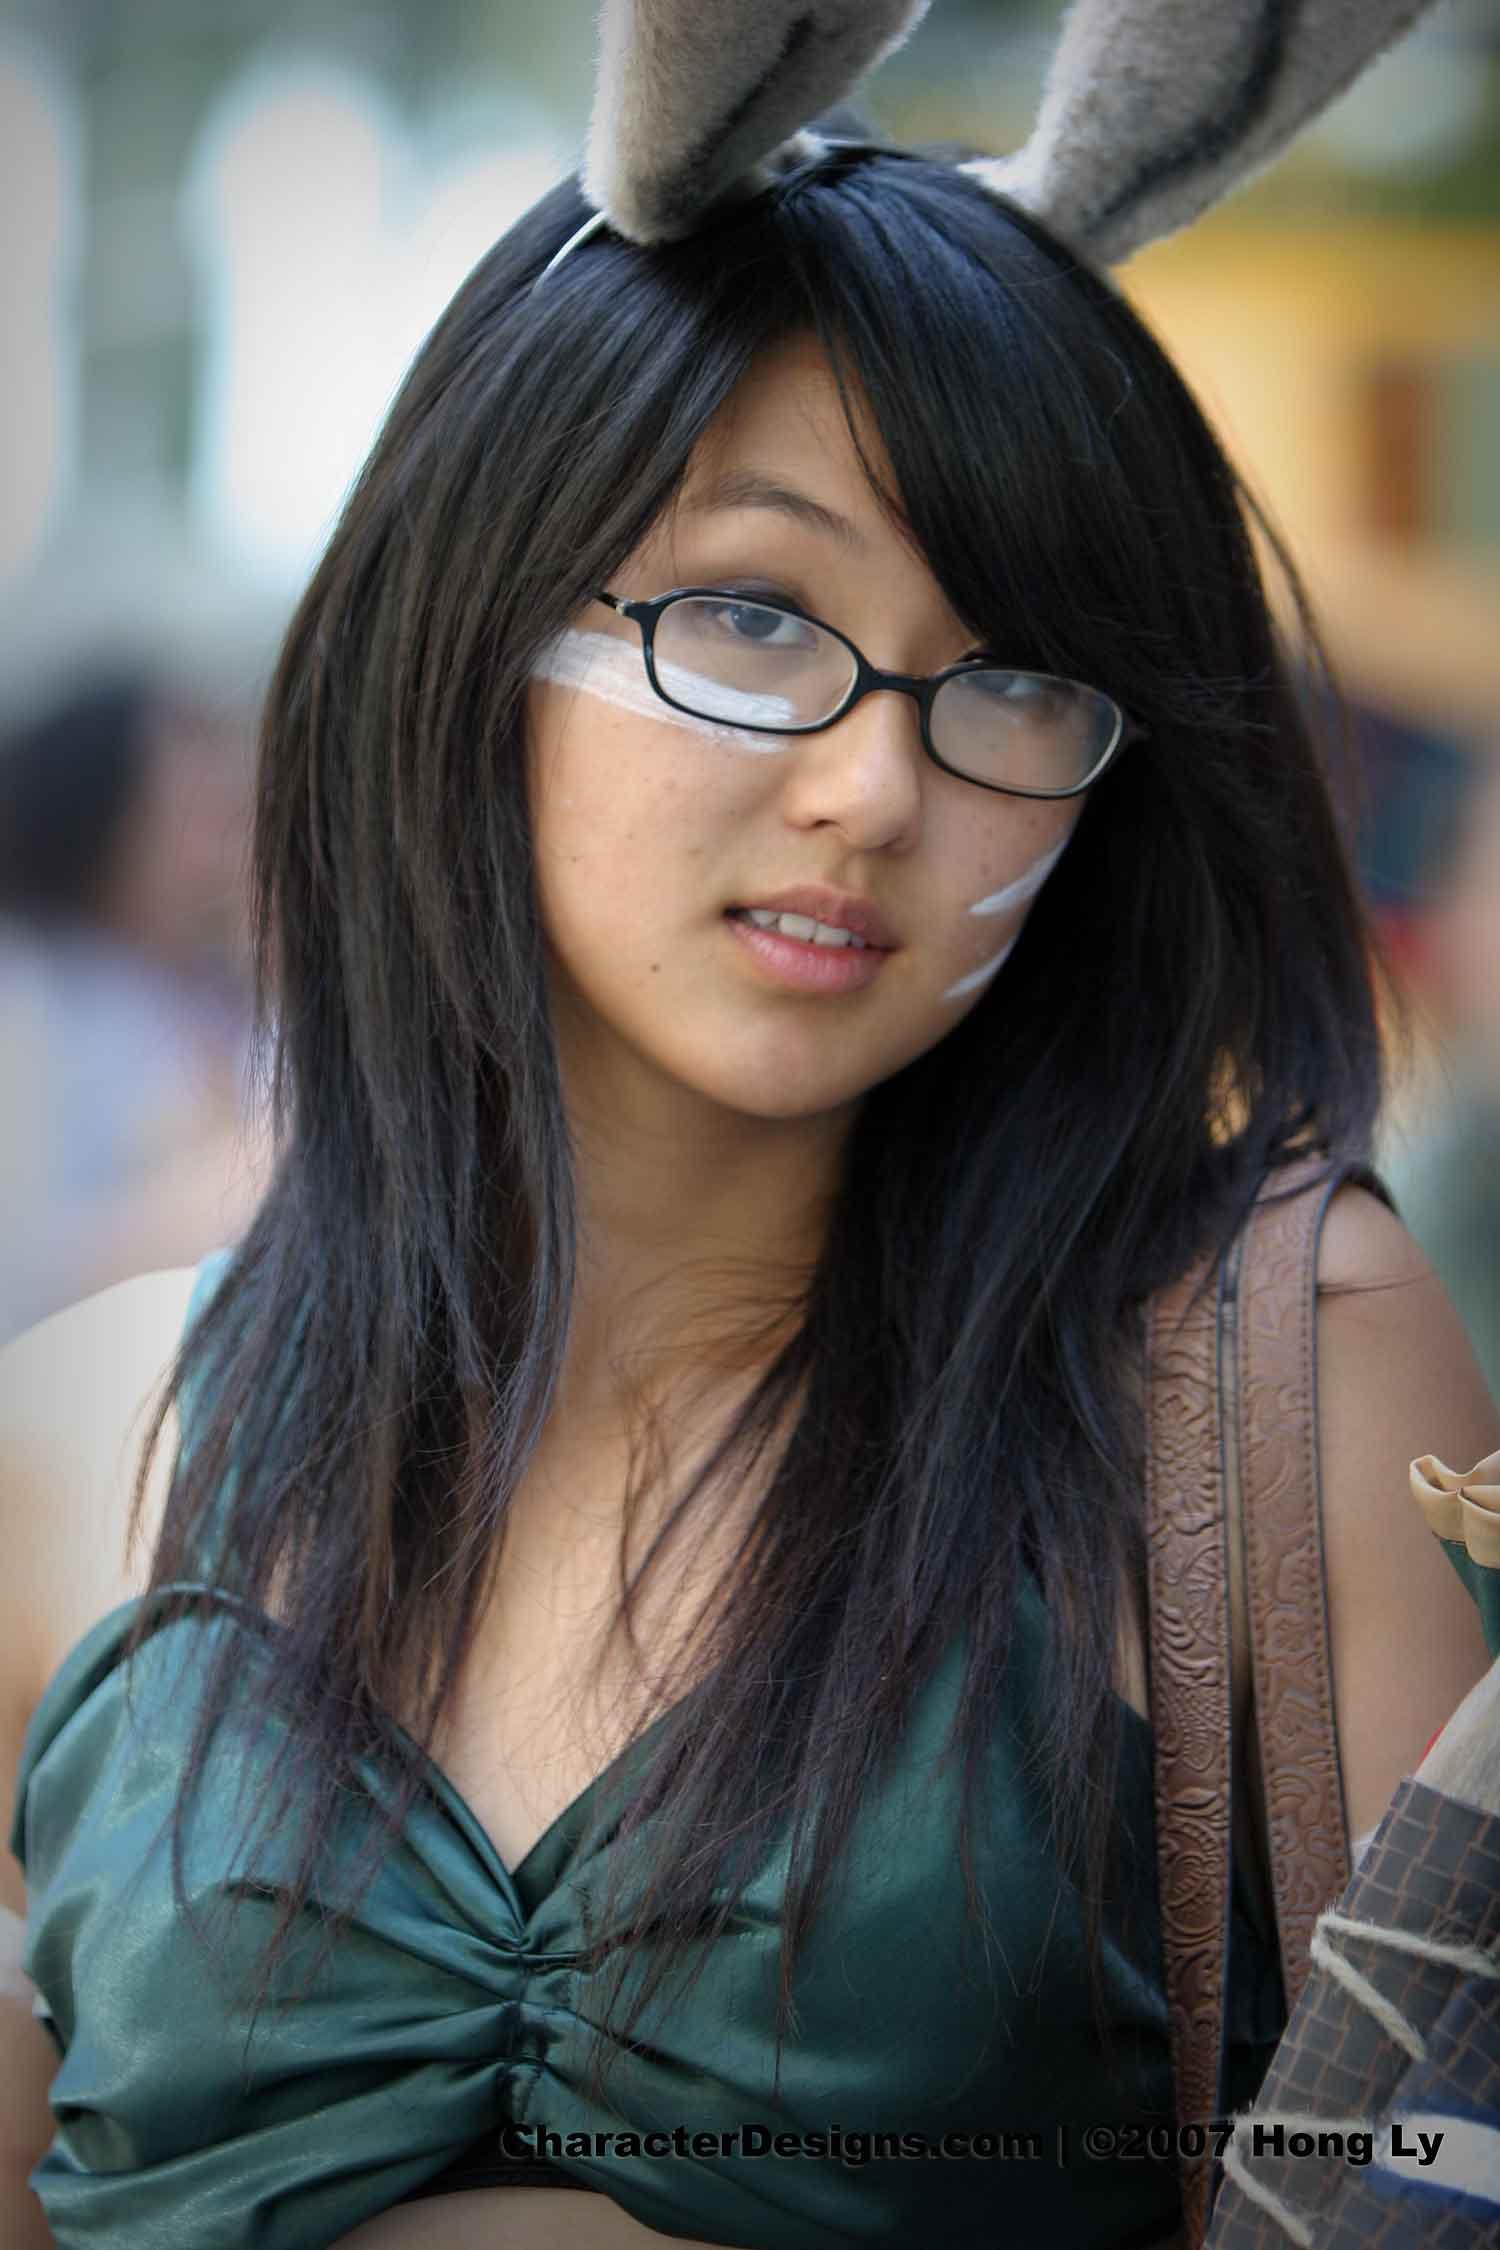 Faces_of_AX_2006_163.jpg